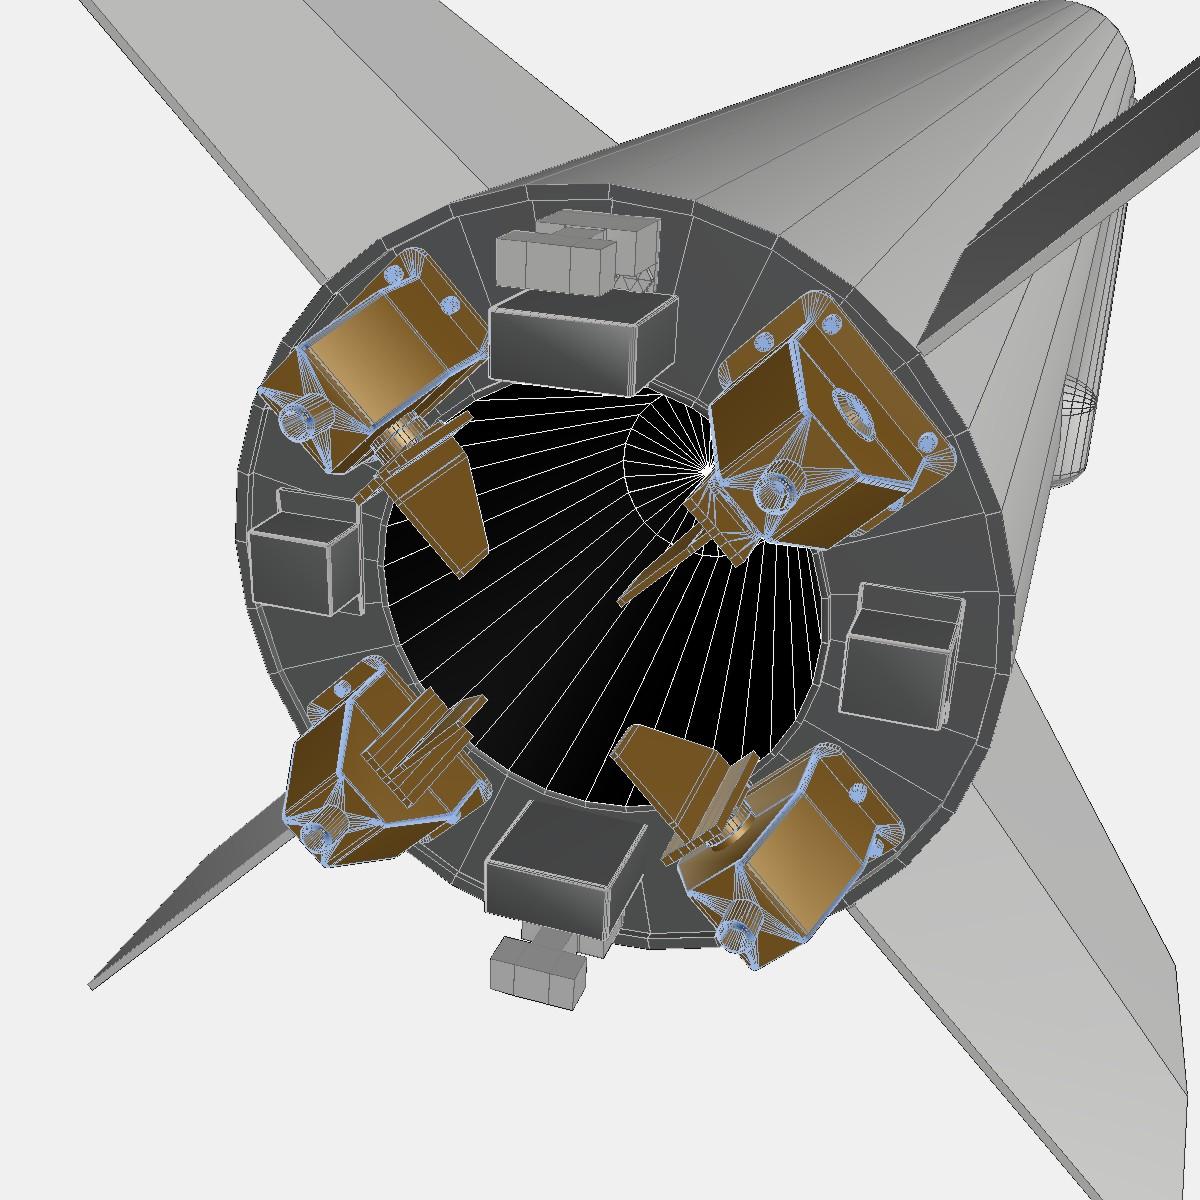 BP-12A Missile 3d model 3ds dxf fbx blend cob dae X obj 217514